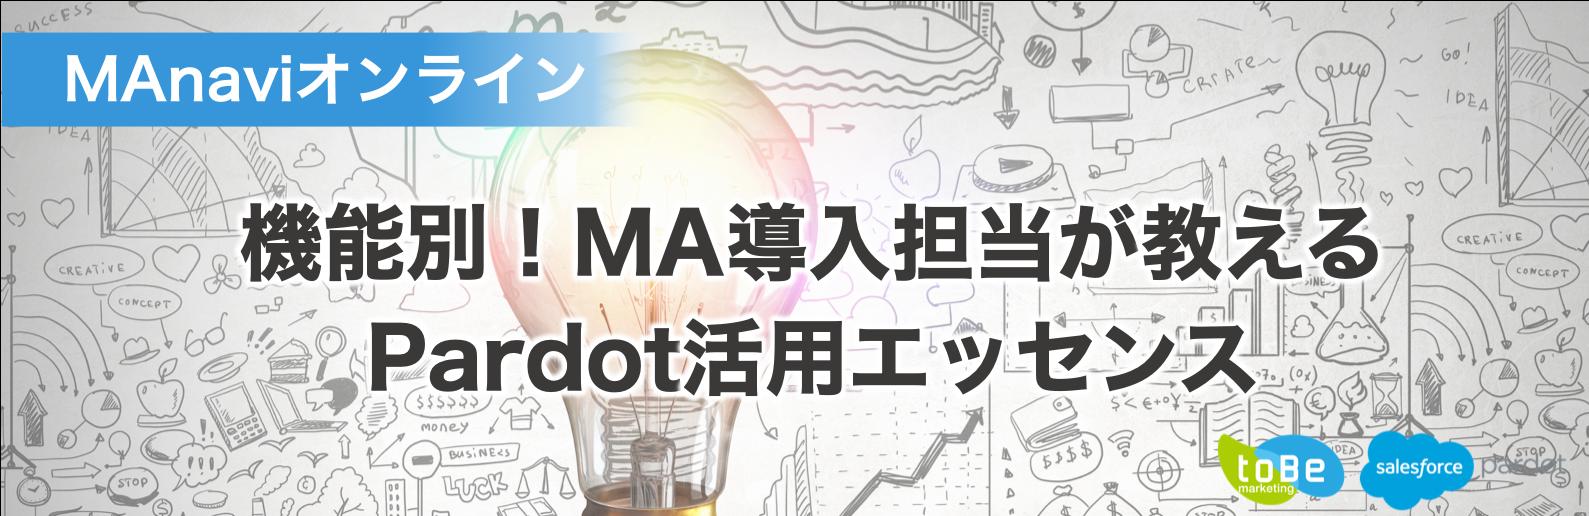 【MAnaviオンライン】機能別!MA導入担当が教えるPardot活用エッセンス